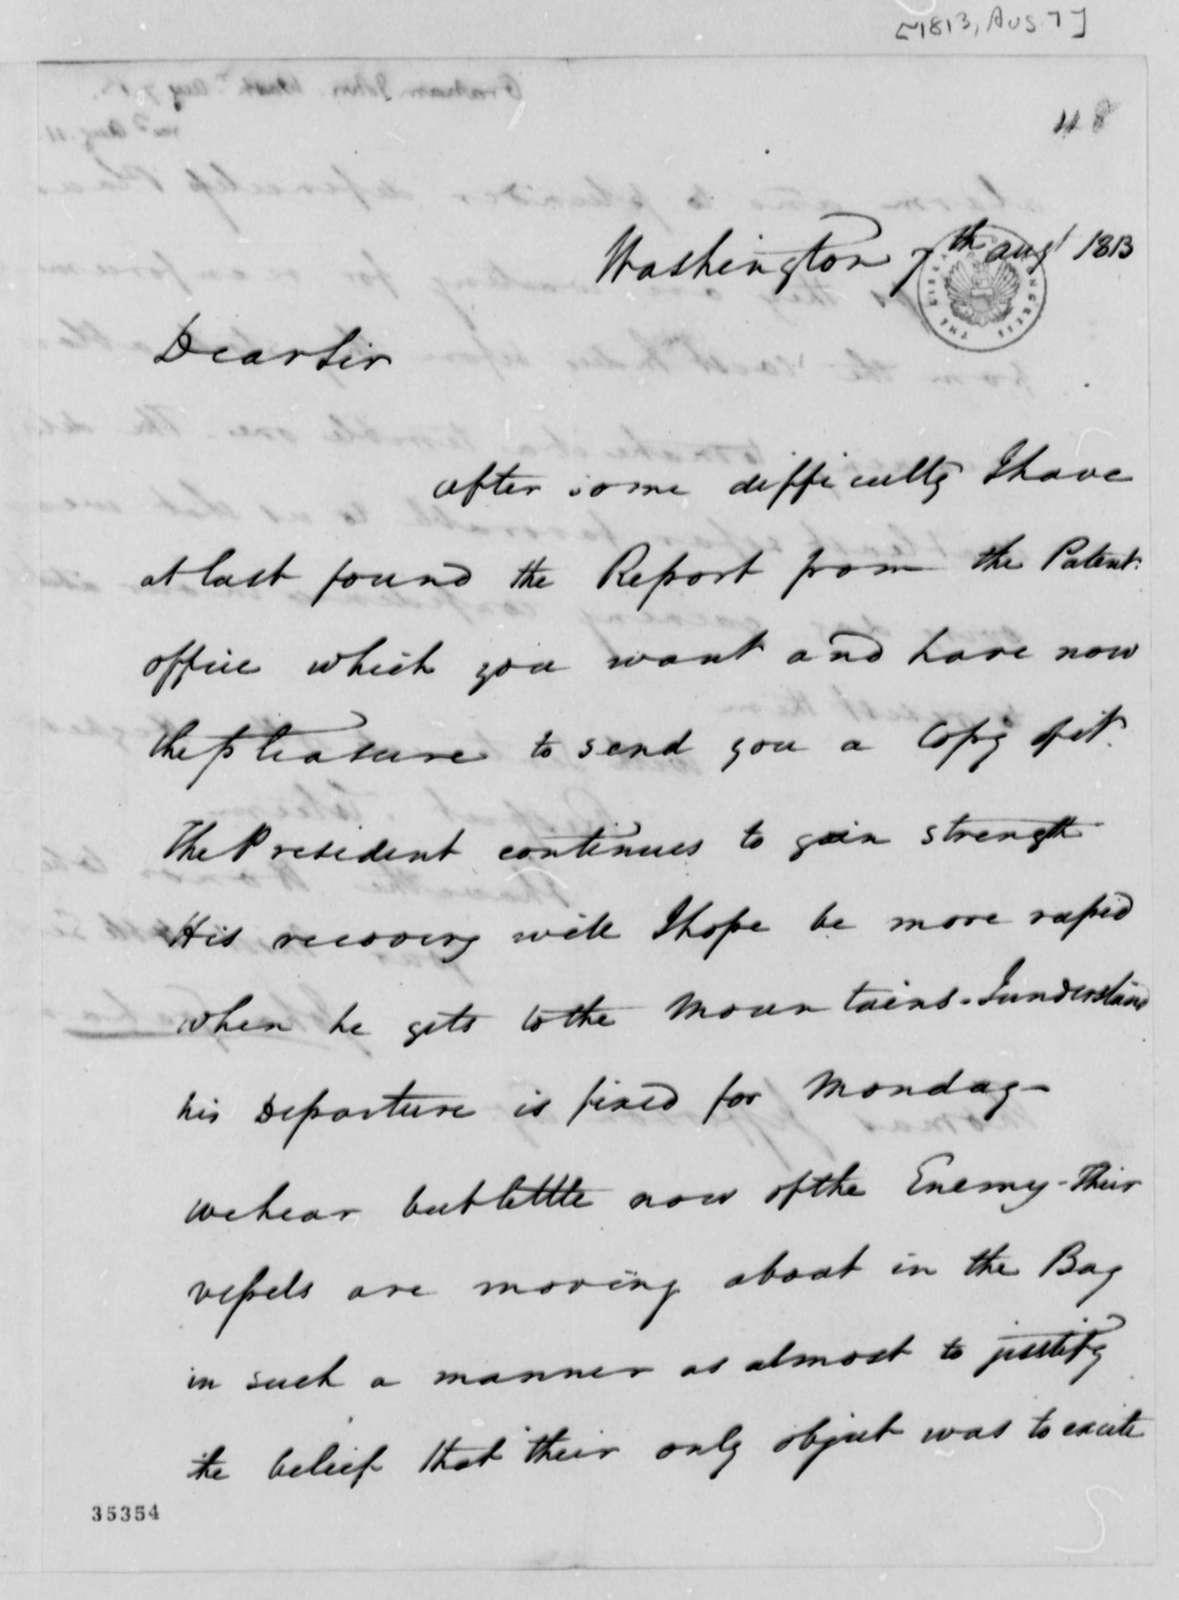 John A. Graham to Thomas Jefferson, August 7, 1813